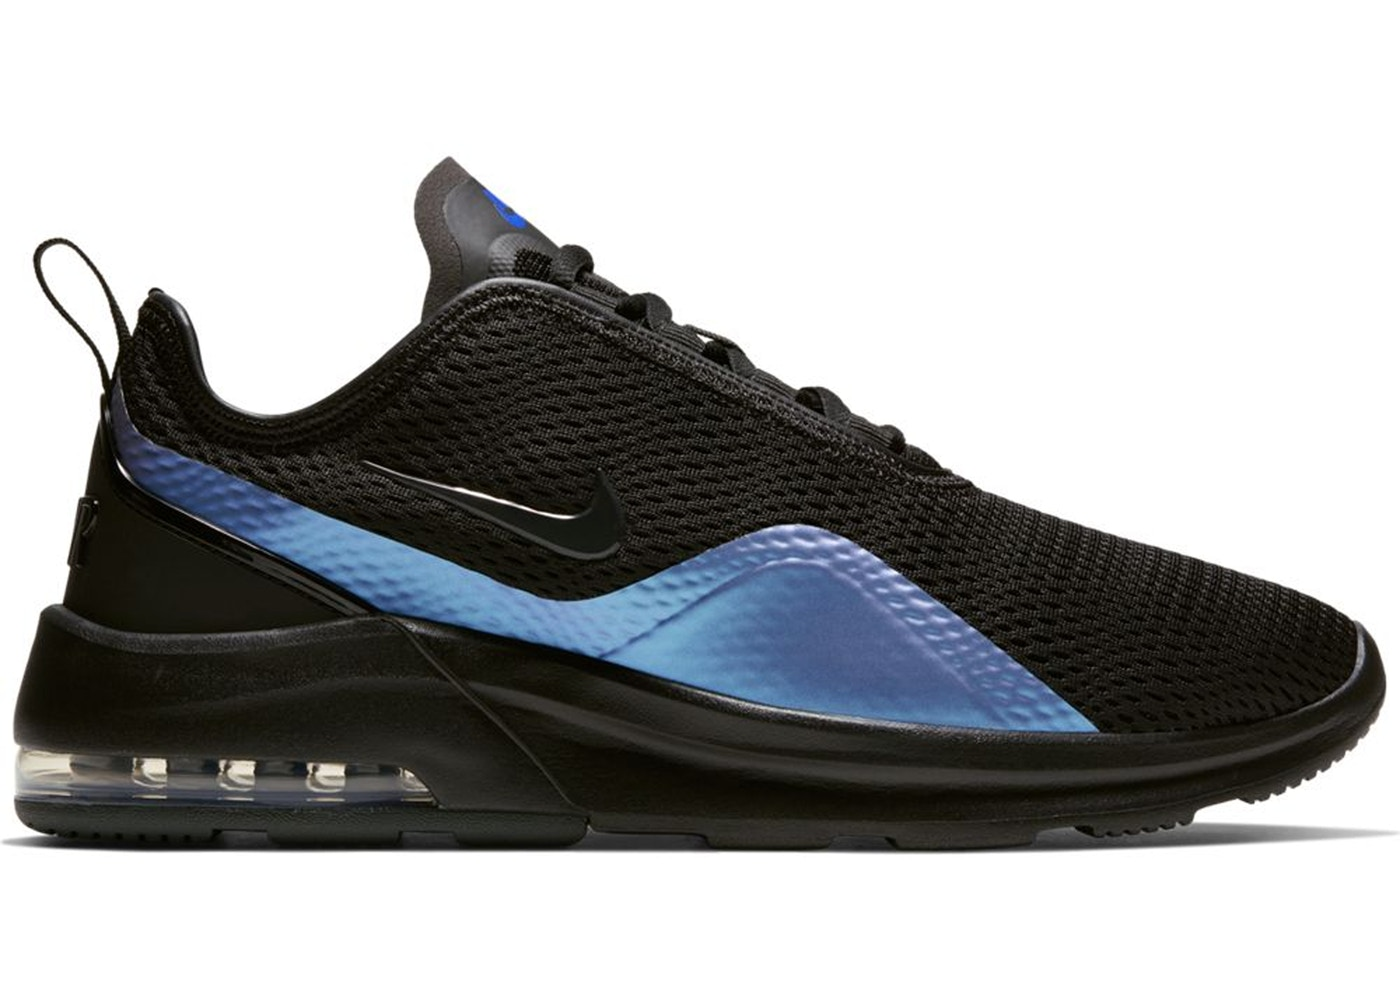 Nike Air Max Motion 2 Throwback Future - AO0266-006